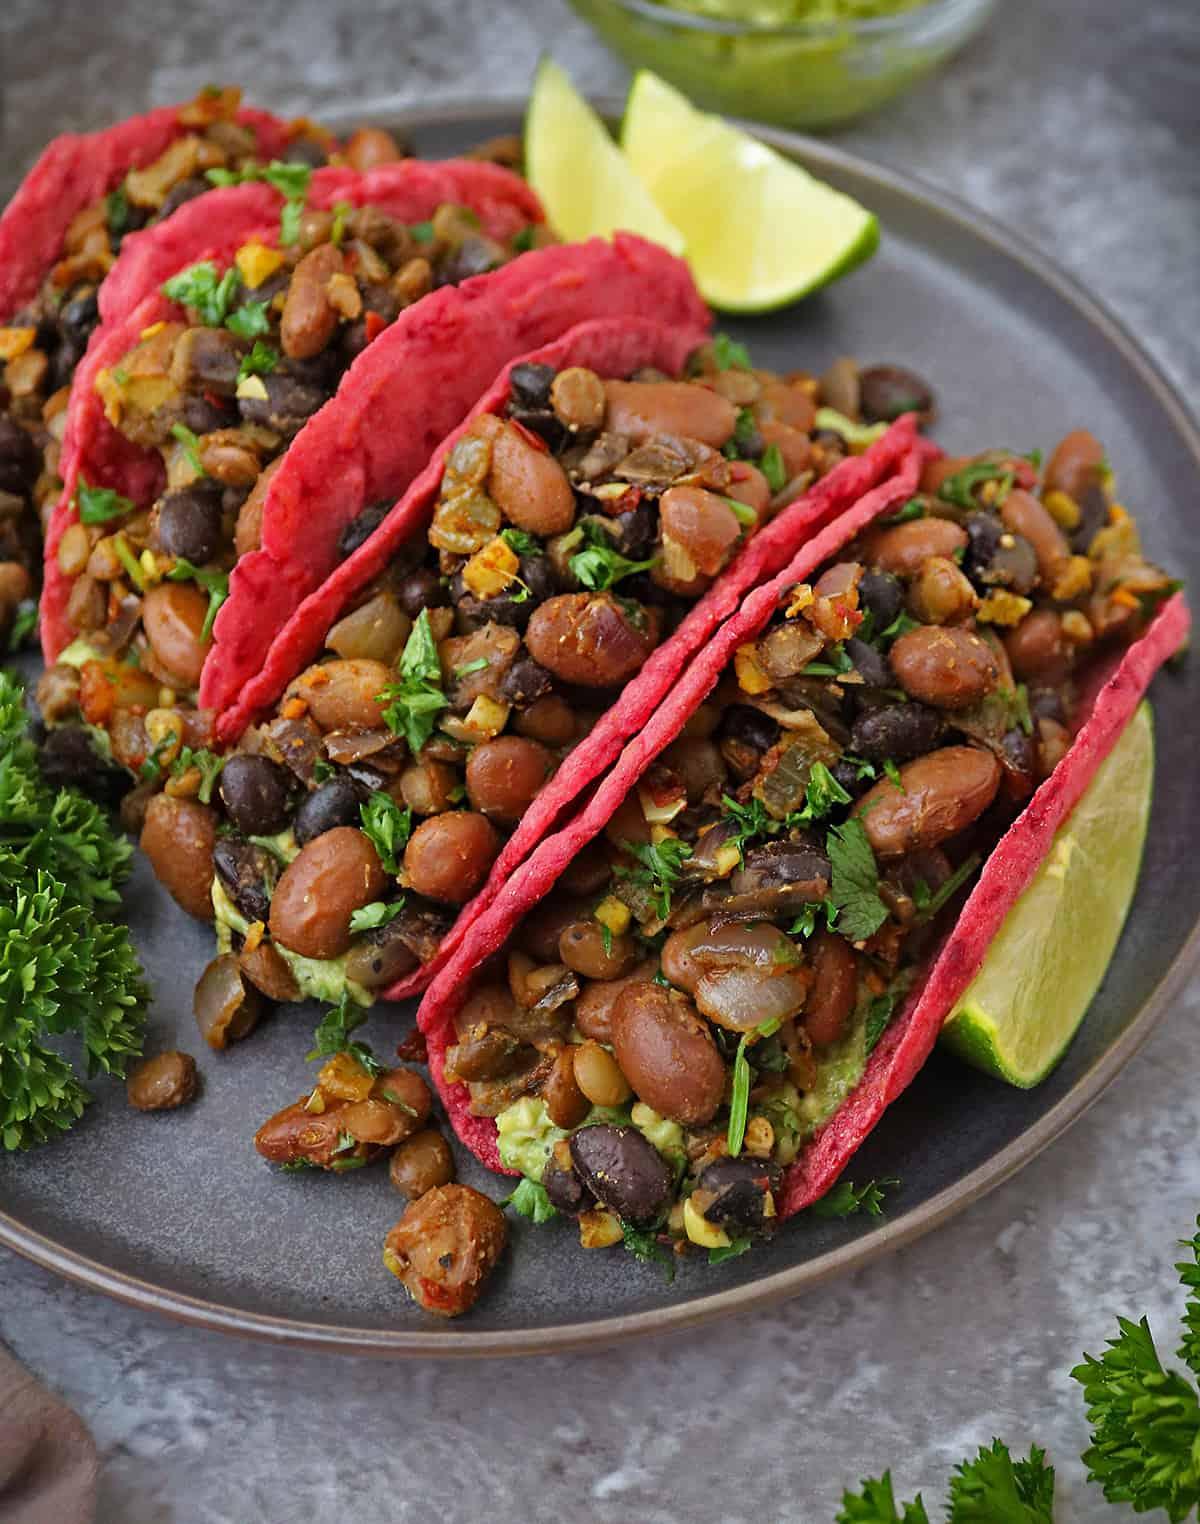 Tasty & Gluten-Free Easy Beet Tortillas With Bean Filling on  plate